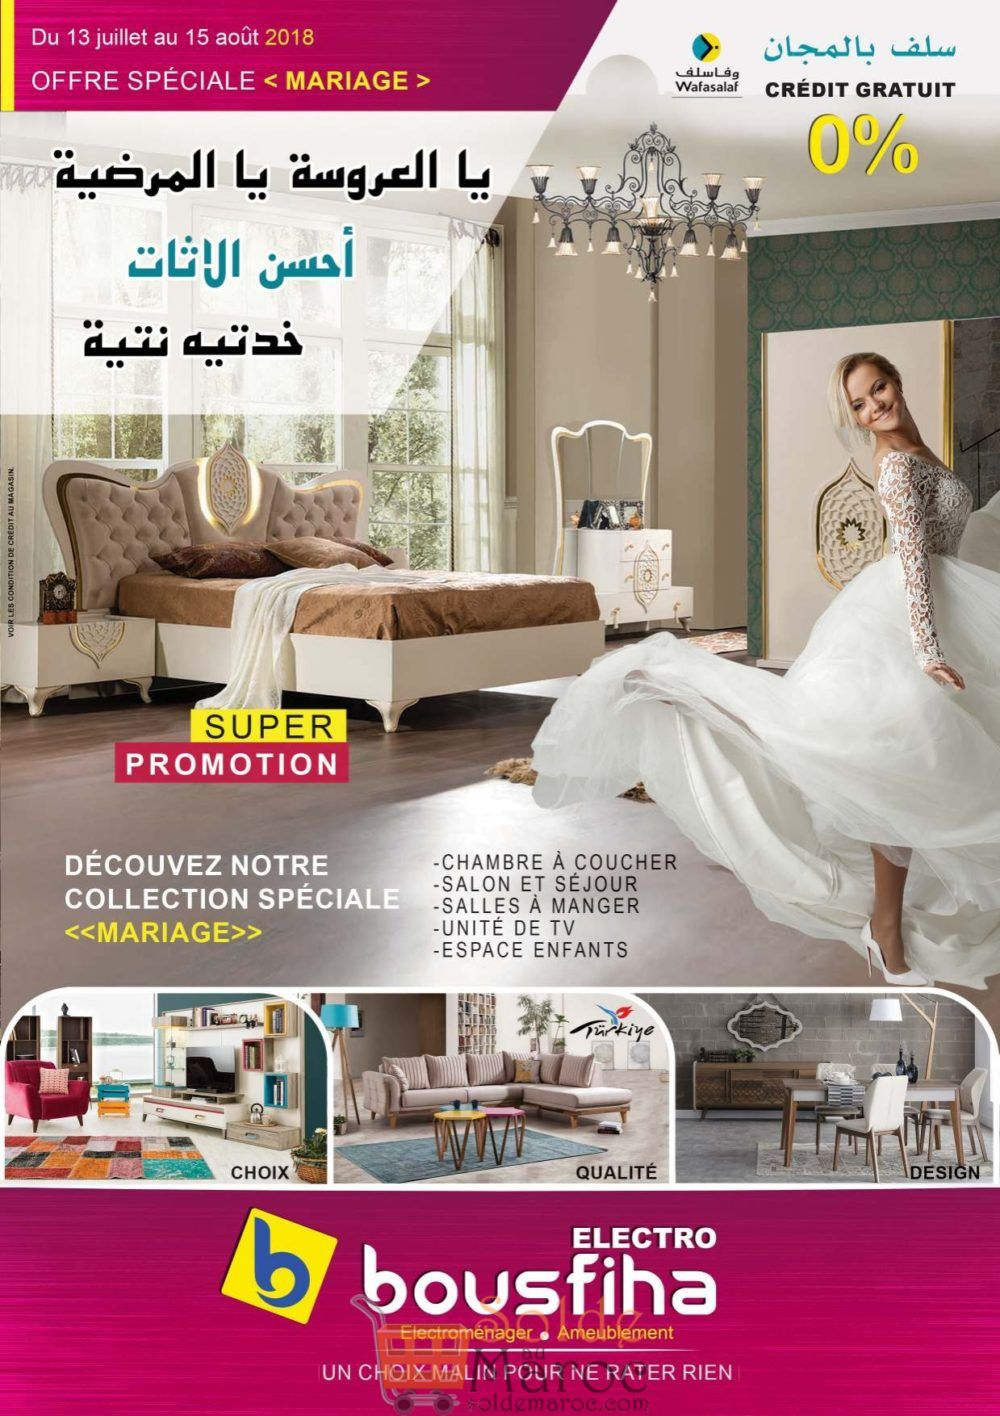 Catalogue Electro Bousfiha Spéciale Mariage jusqu'au 15 Août 2018